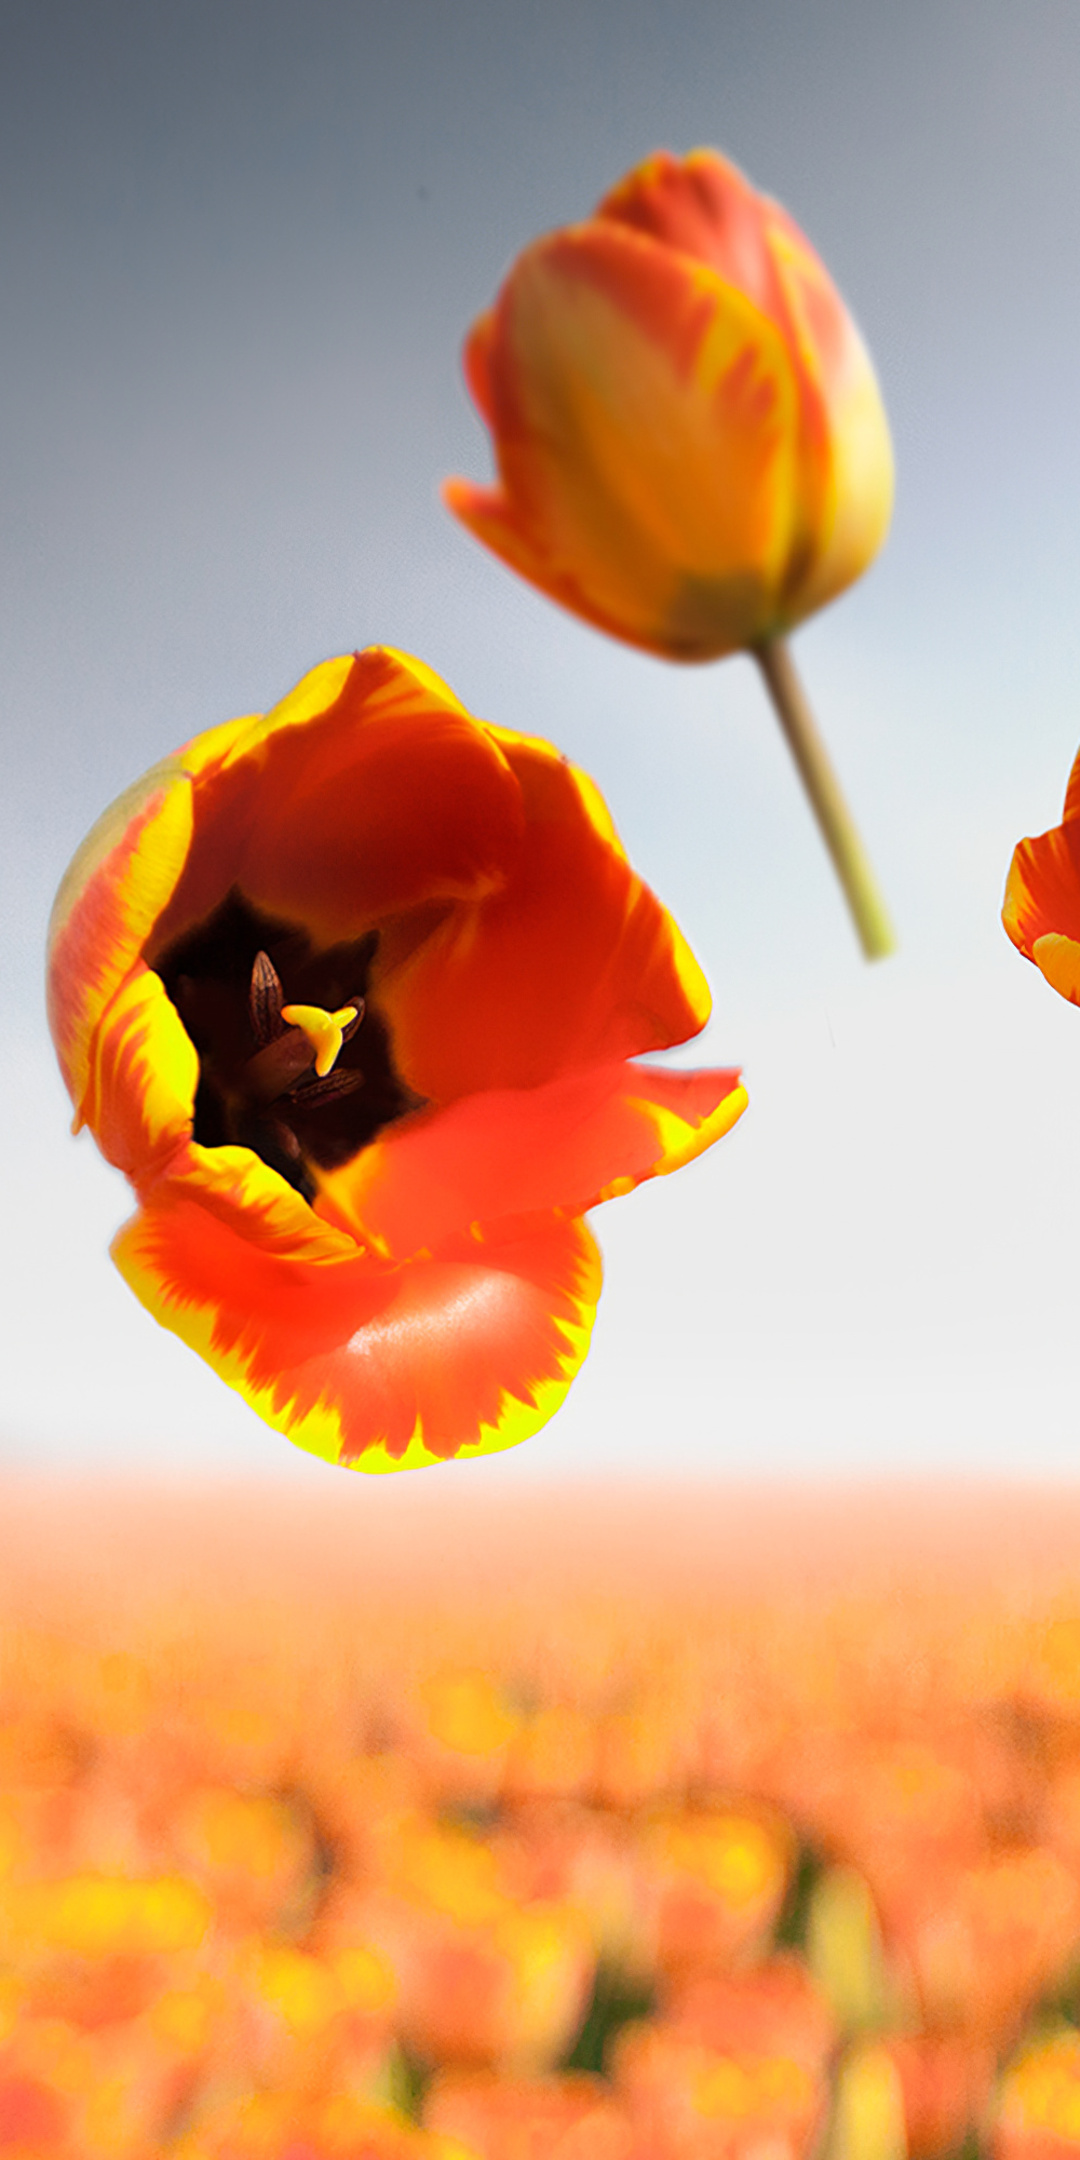 banja-luka-flowers-l8.jpg